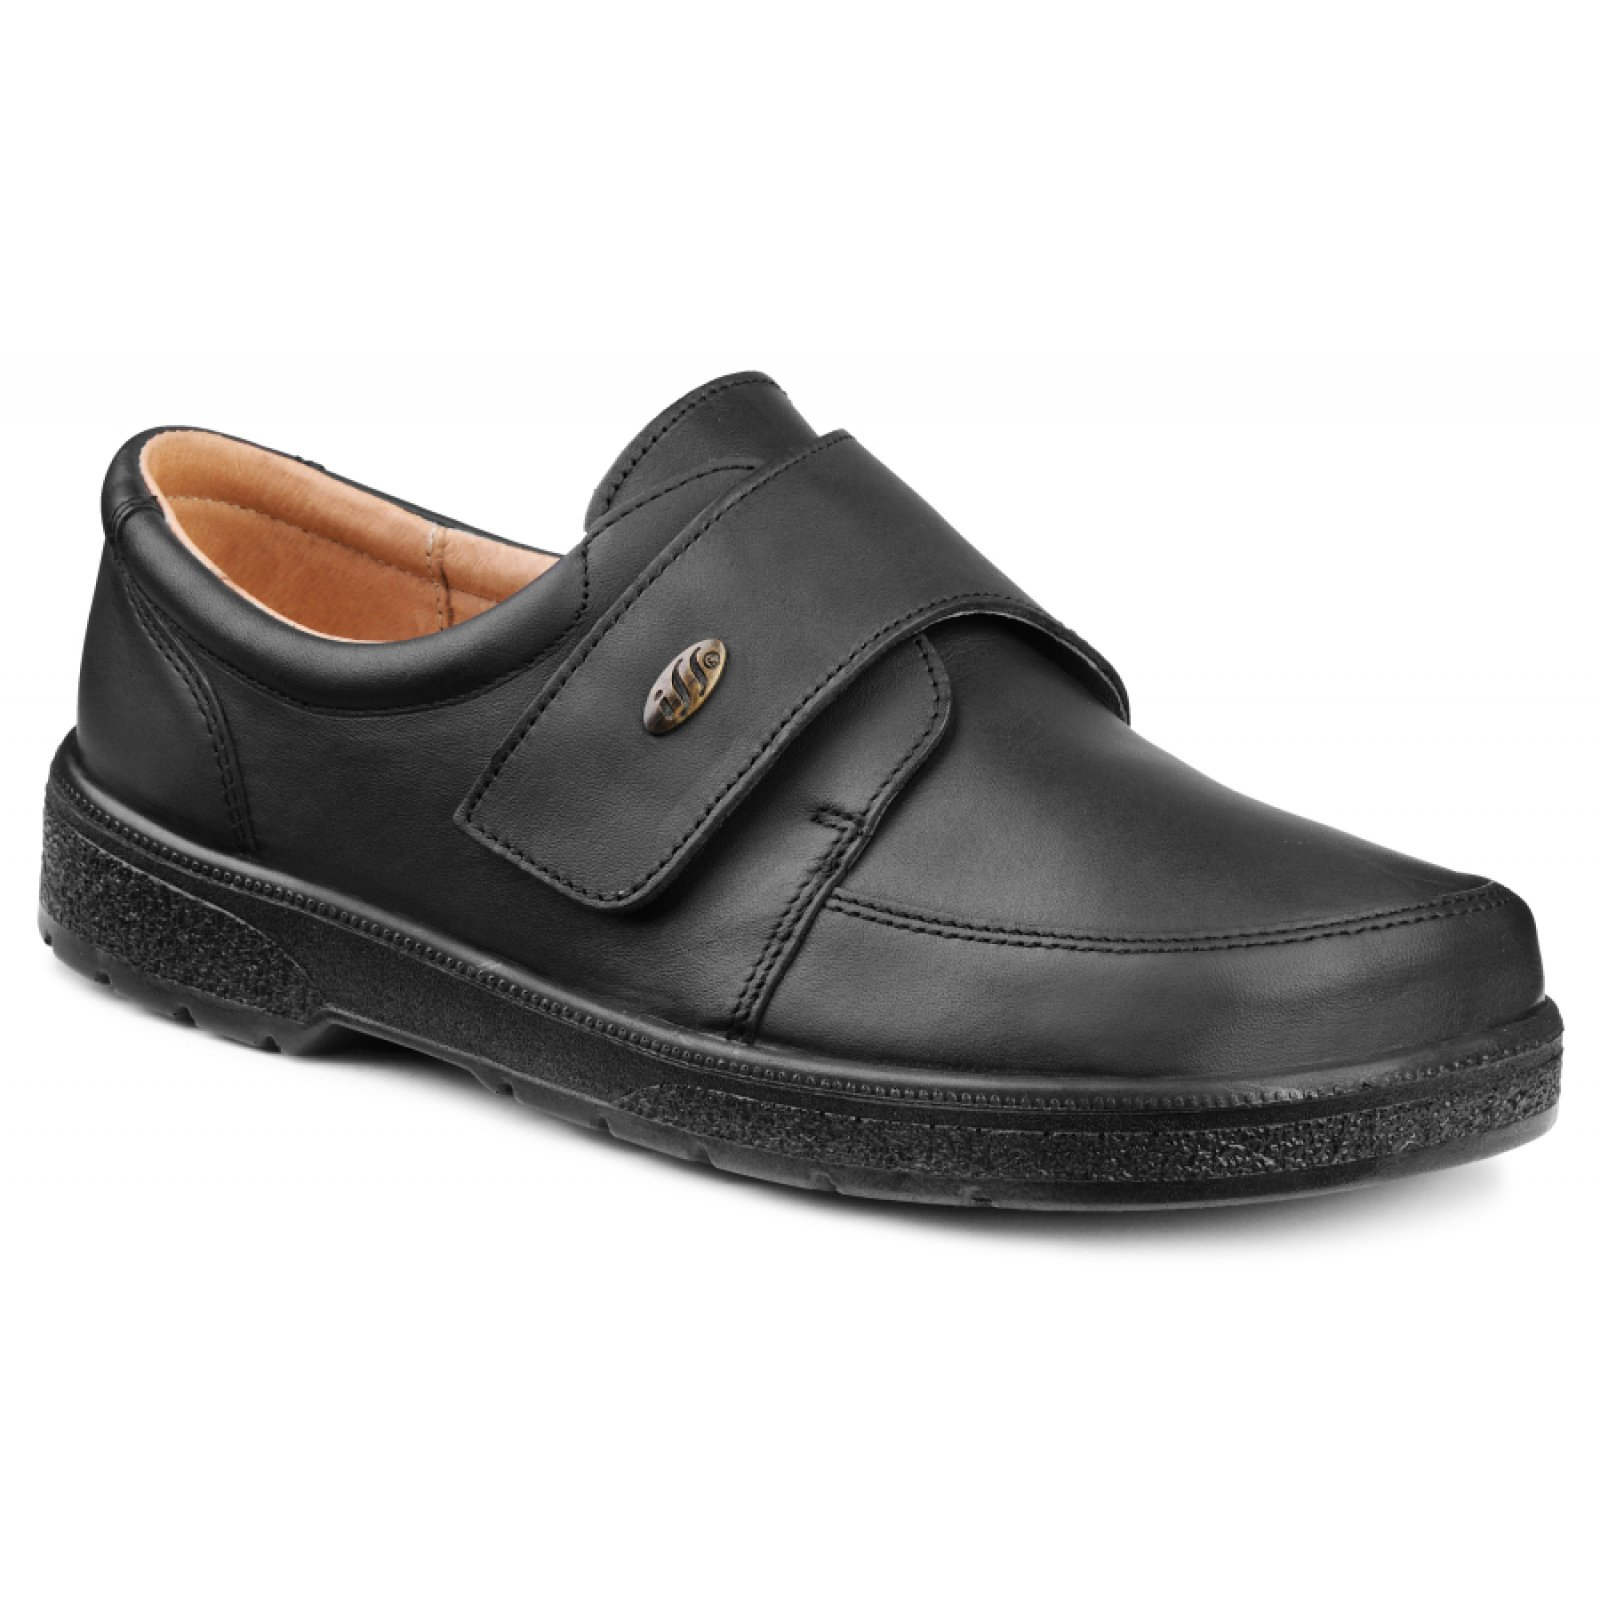 018f05a28d1 RUDO černý - pánská obuv pro diabetiky